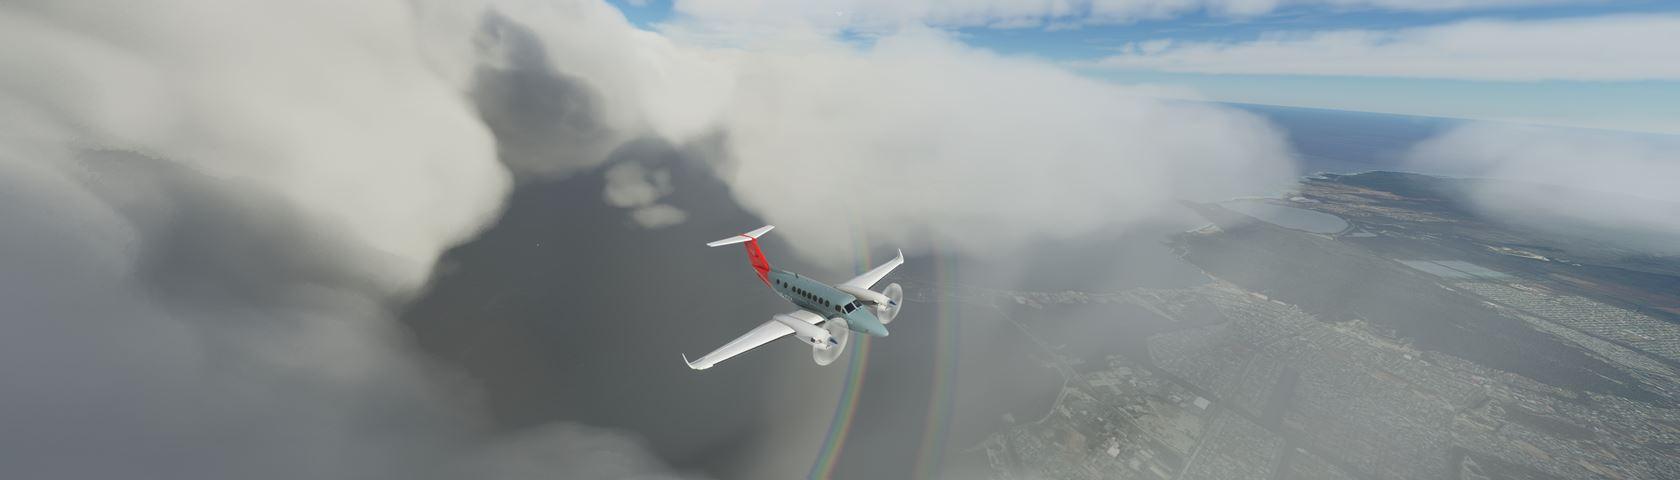 FS2020 Over Jamaica